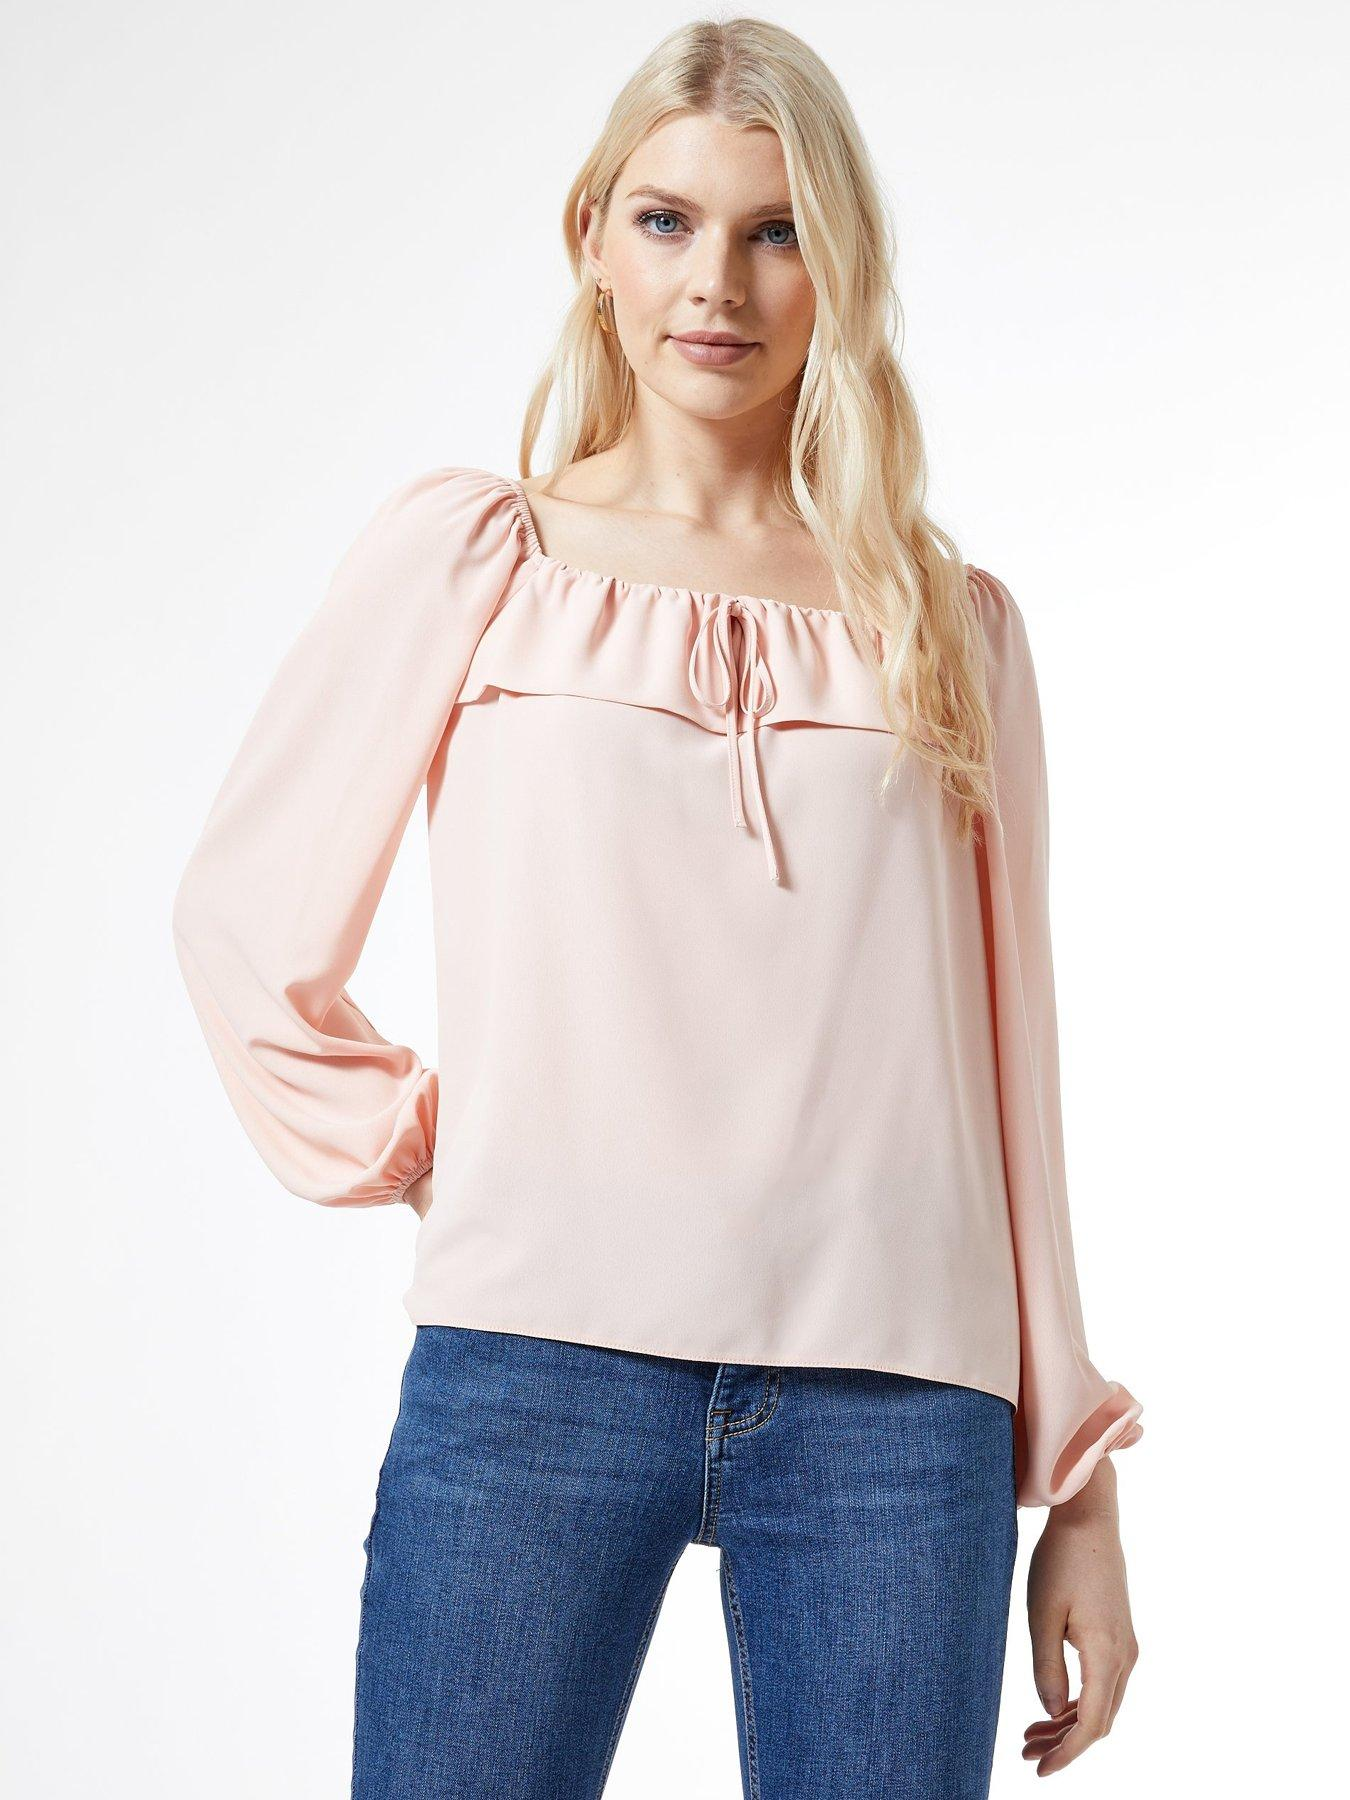 Personalized Master Fishing Cotton Girl Toddler Long Sleeve Ruffle Shirt Top